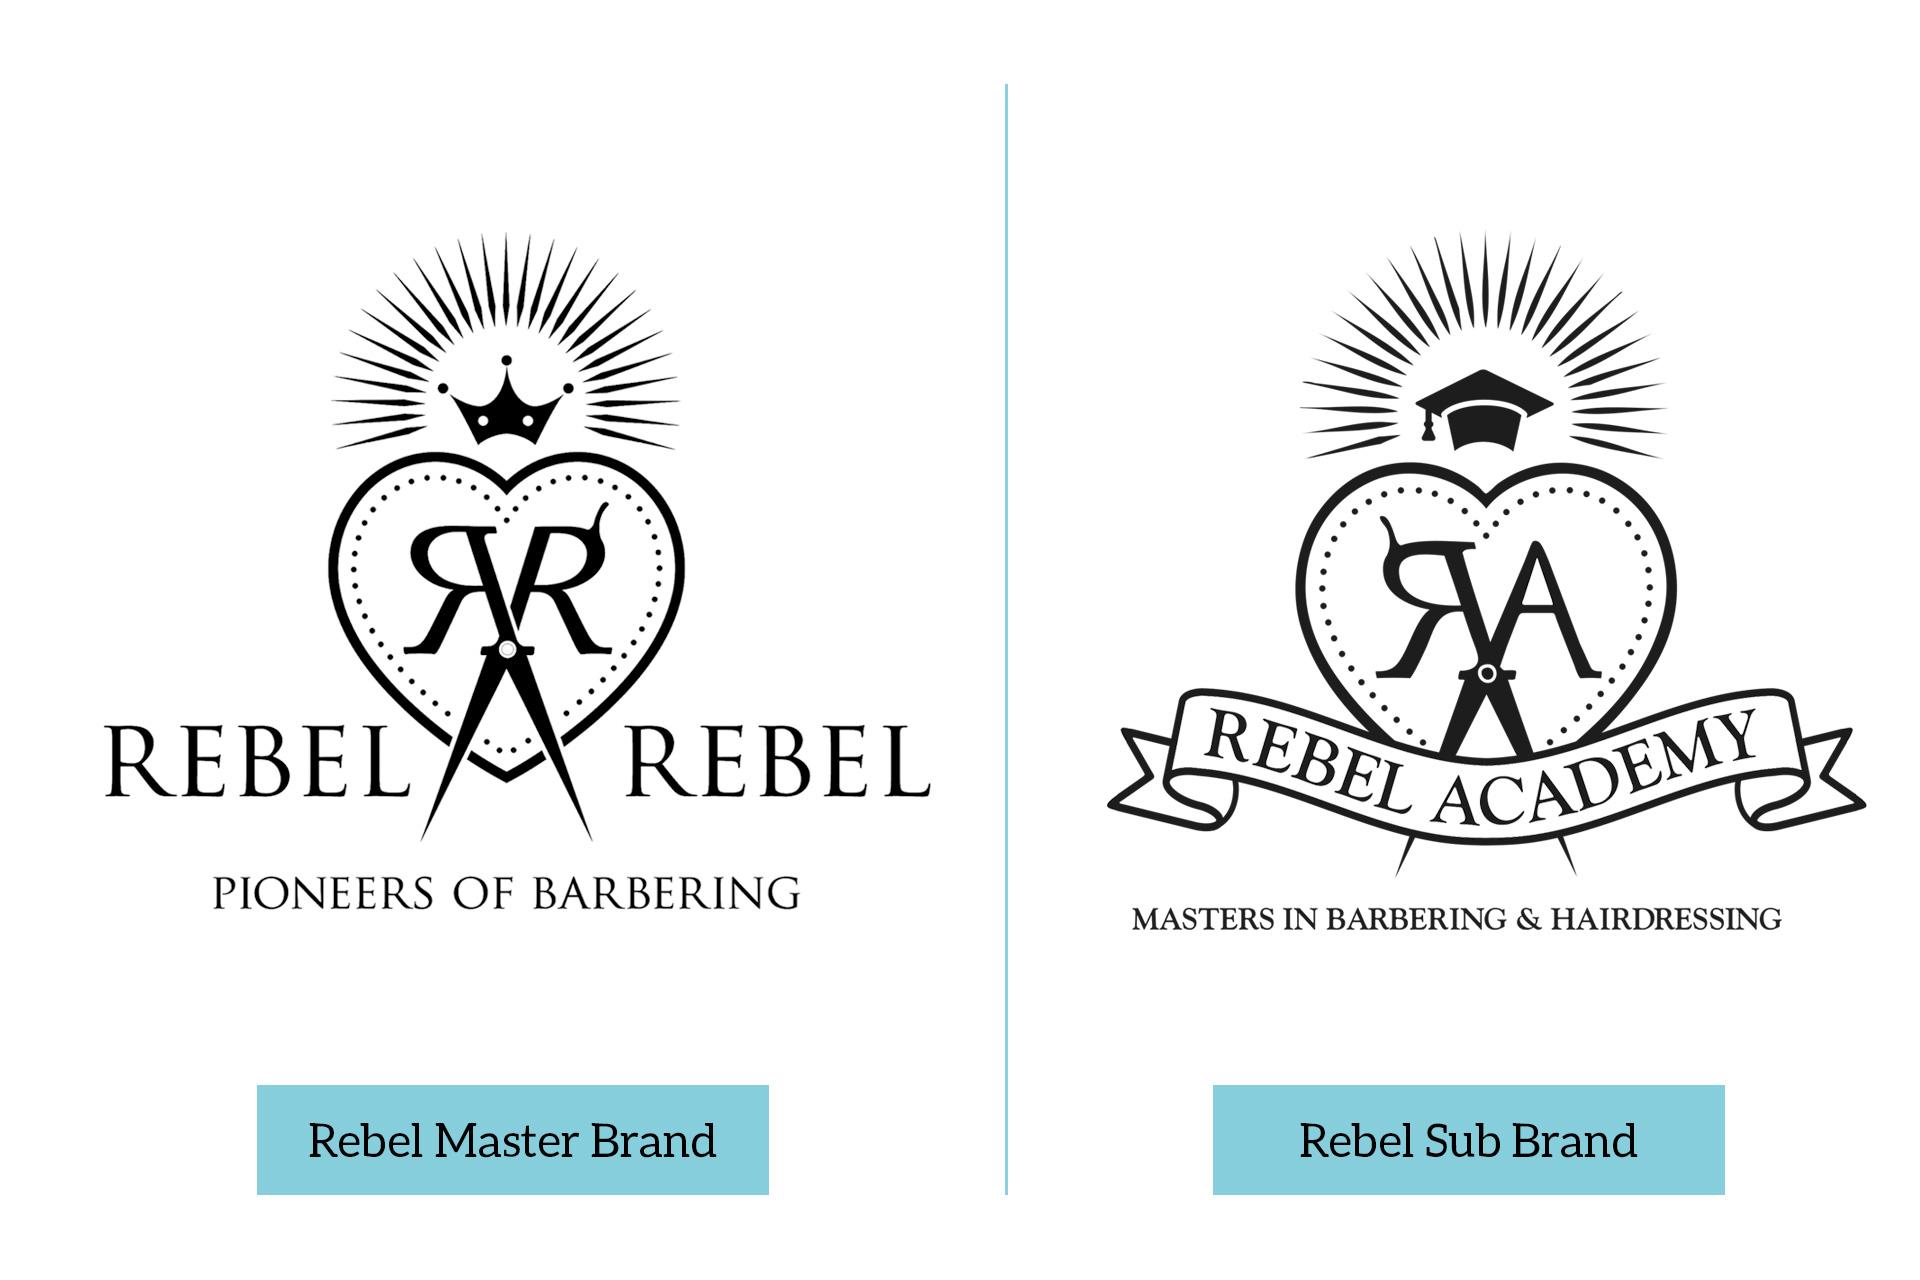 Rebel_brands-sub